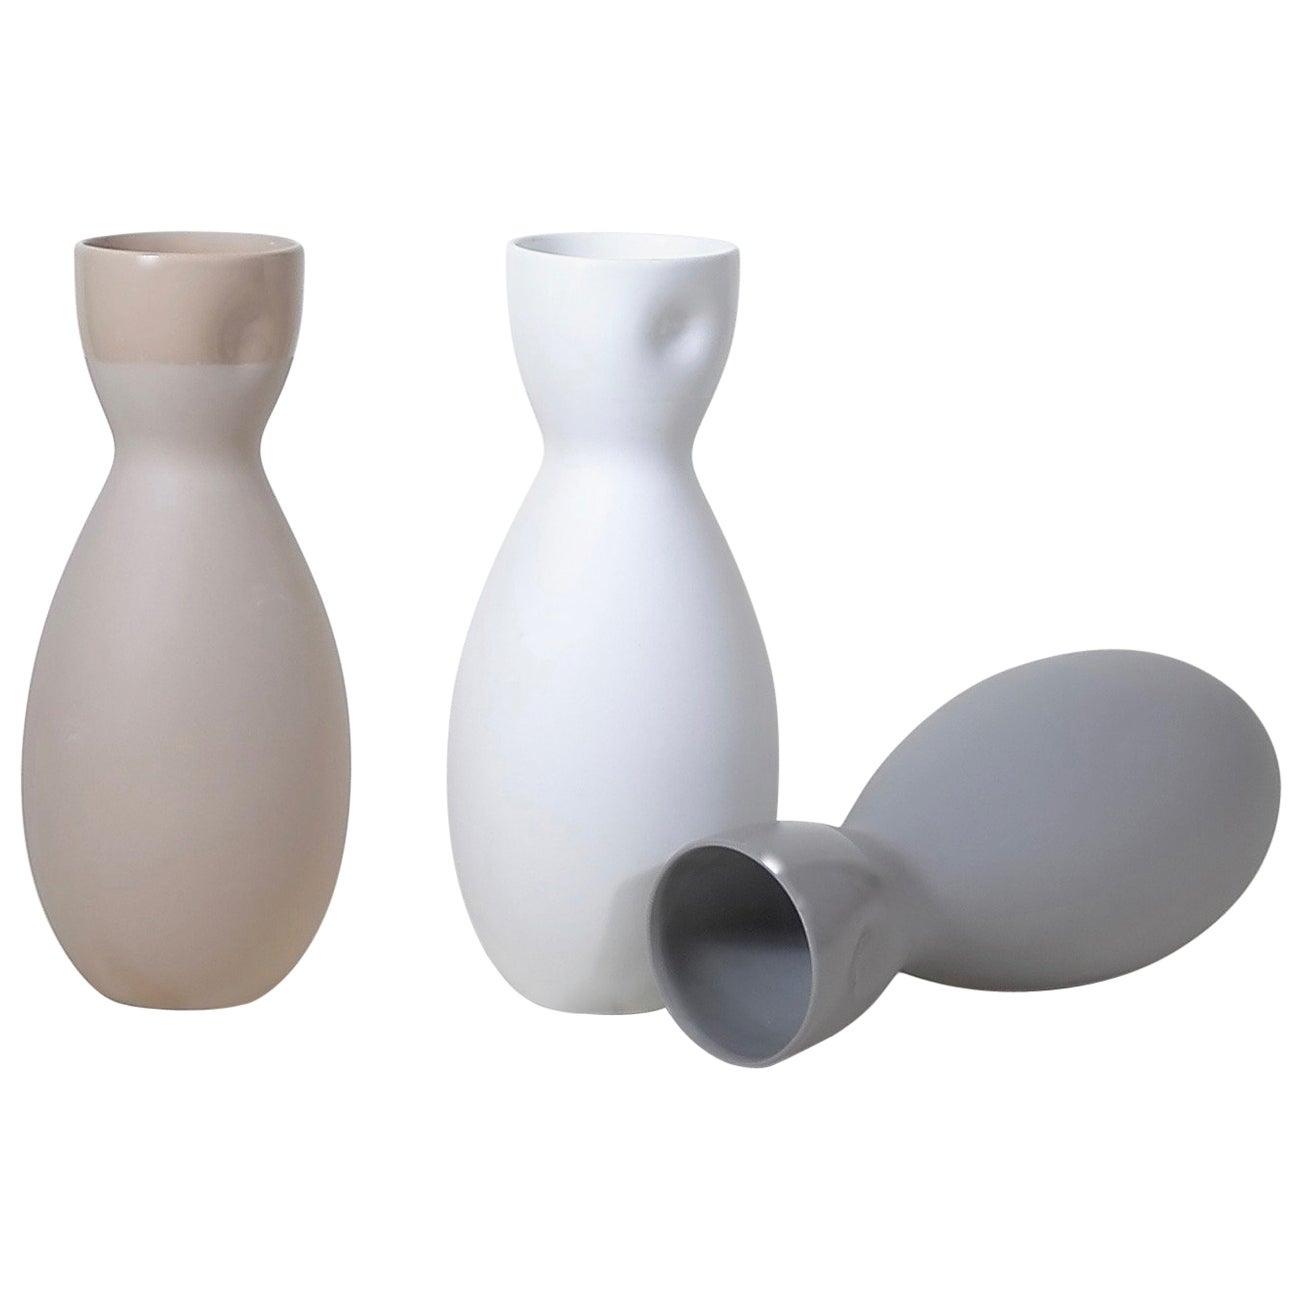 Dimpled Porcelain Carafe in Matte Bisque